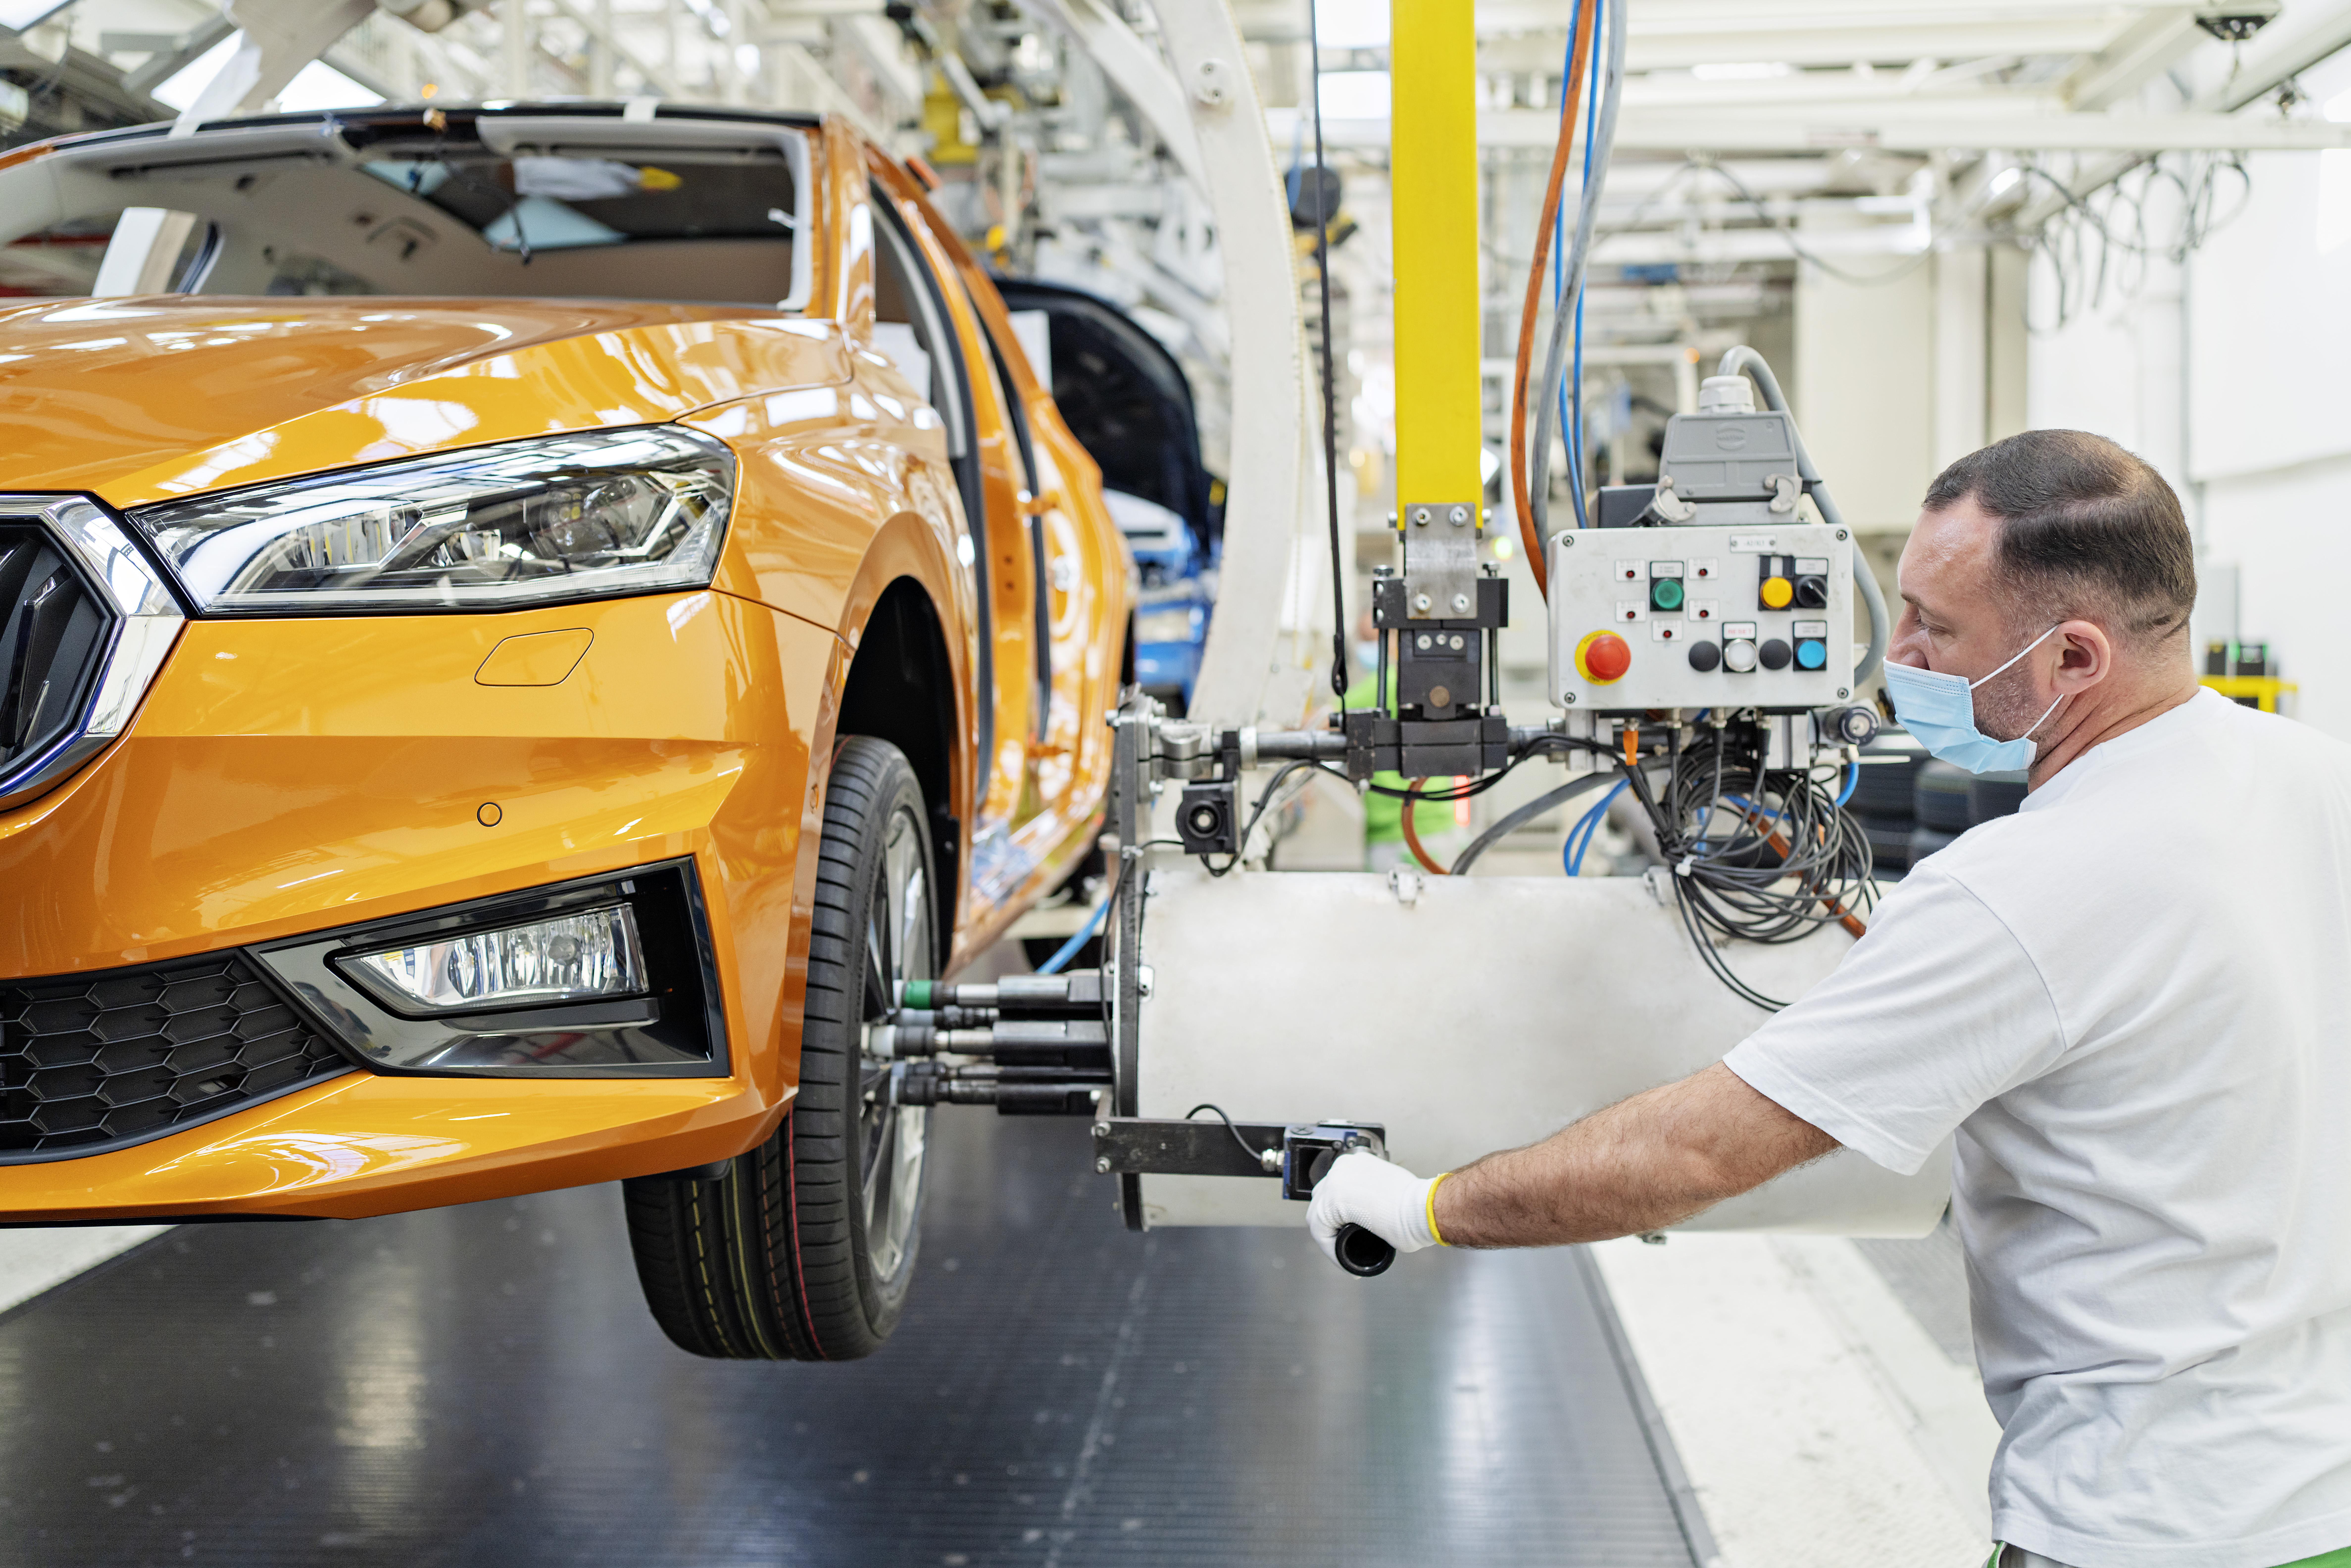 Start of production of the new SKODA FABIA at main plant in Mladá Boleslav - Image 2